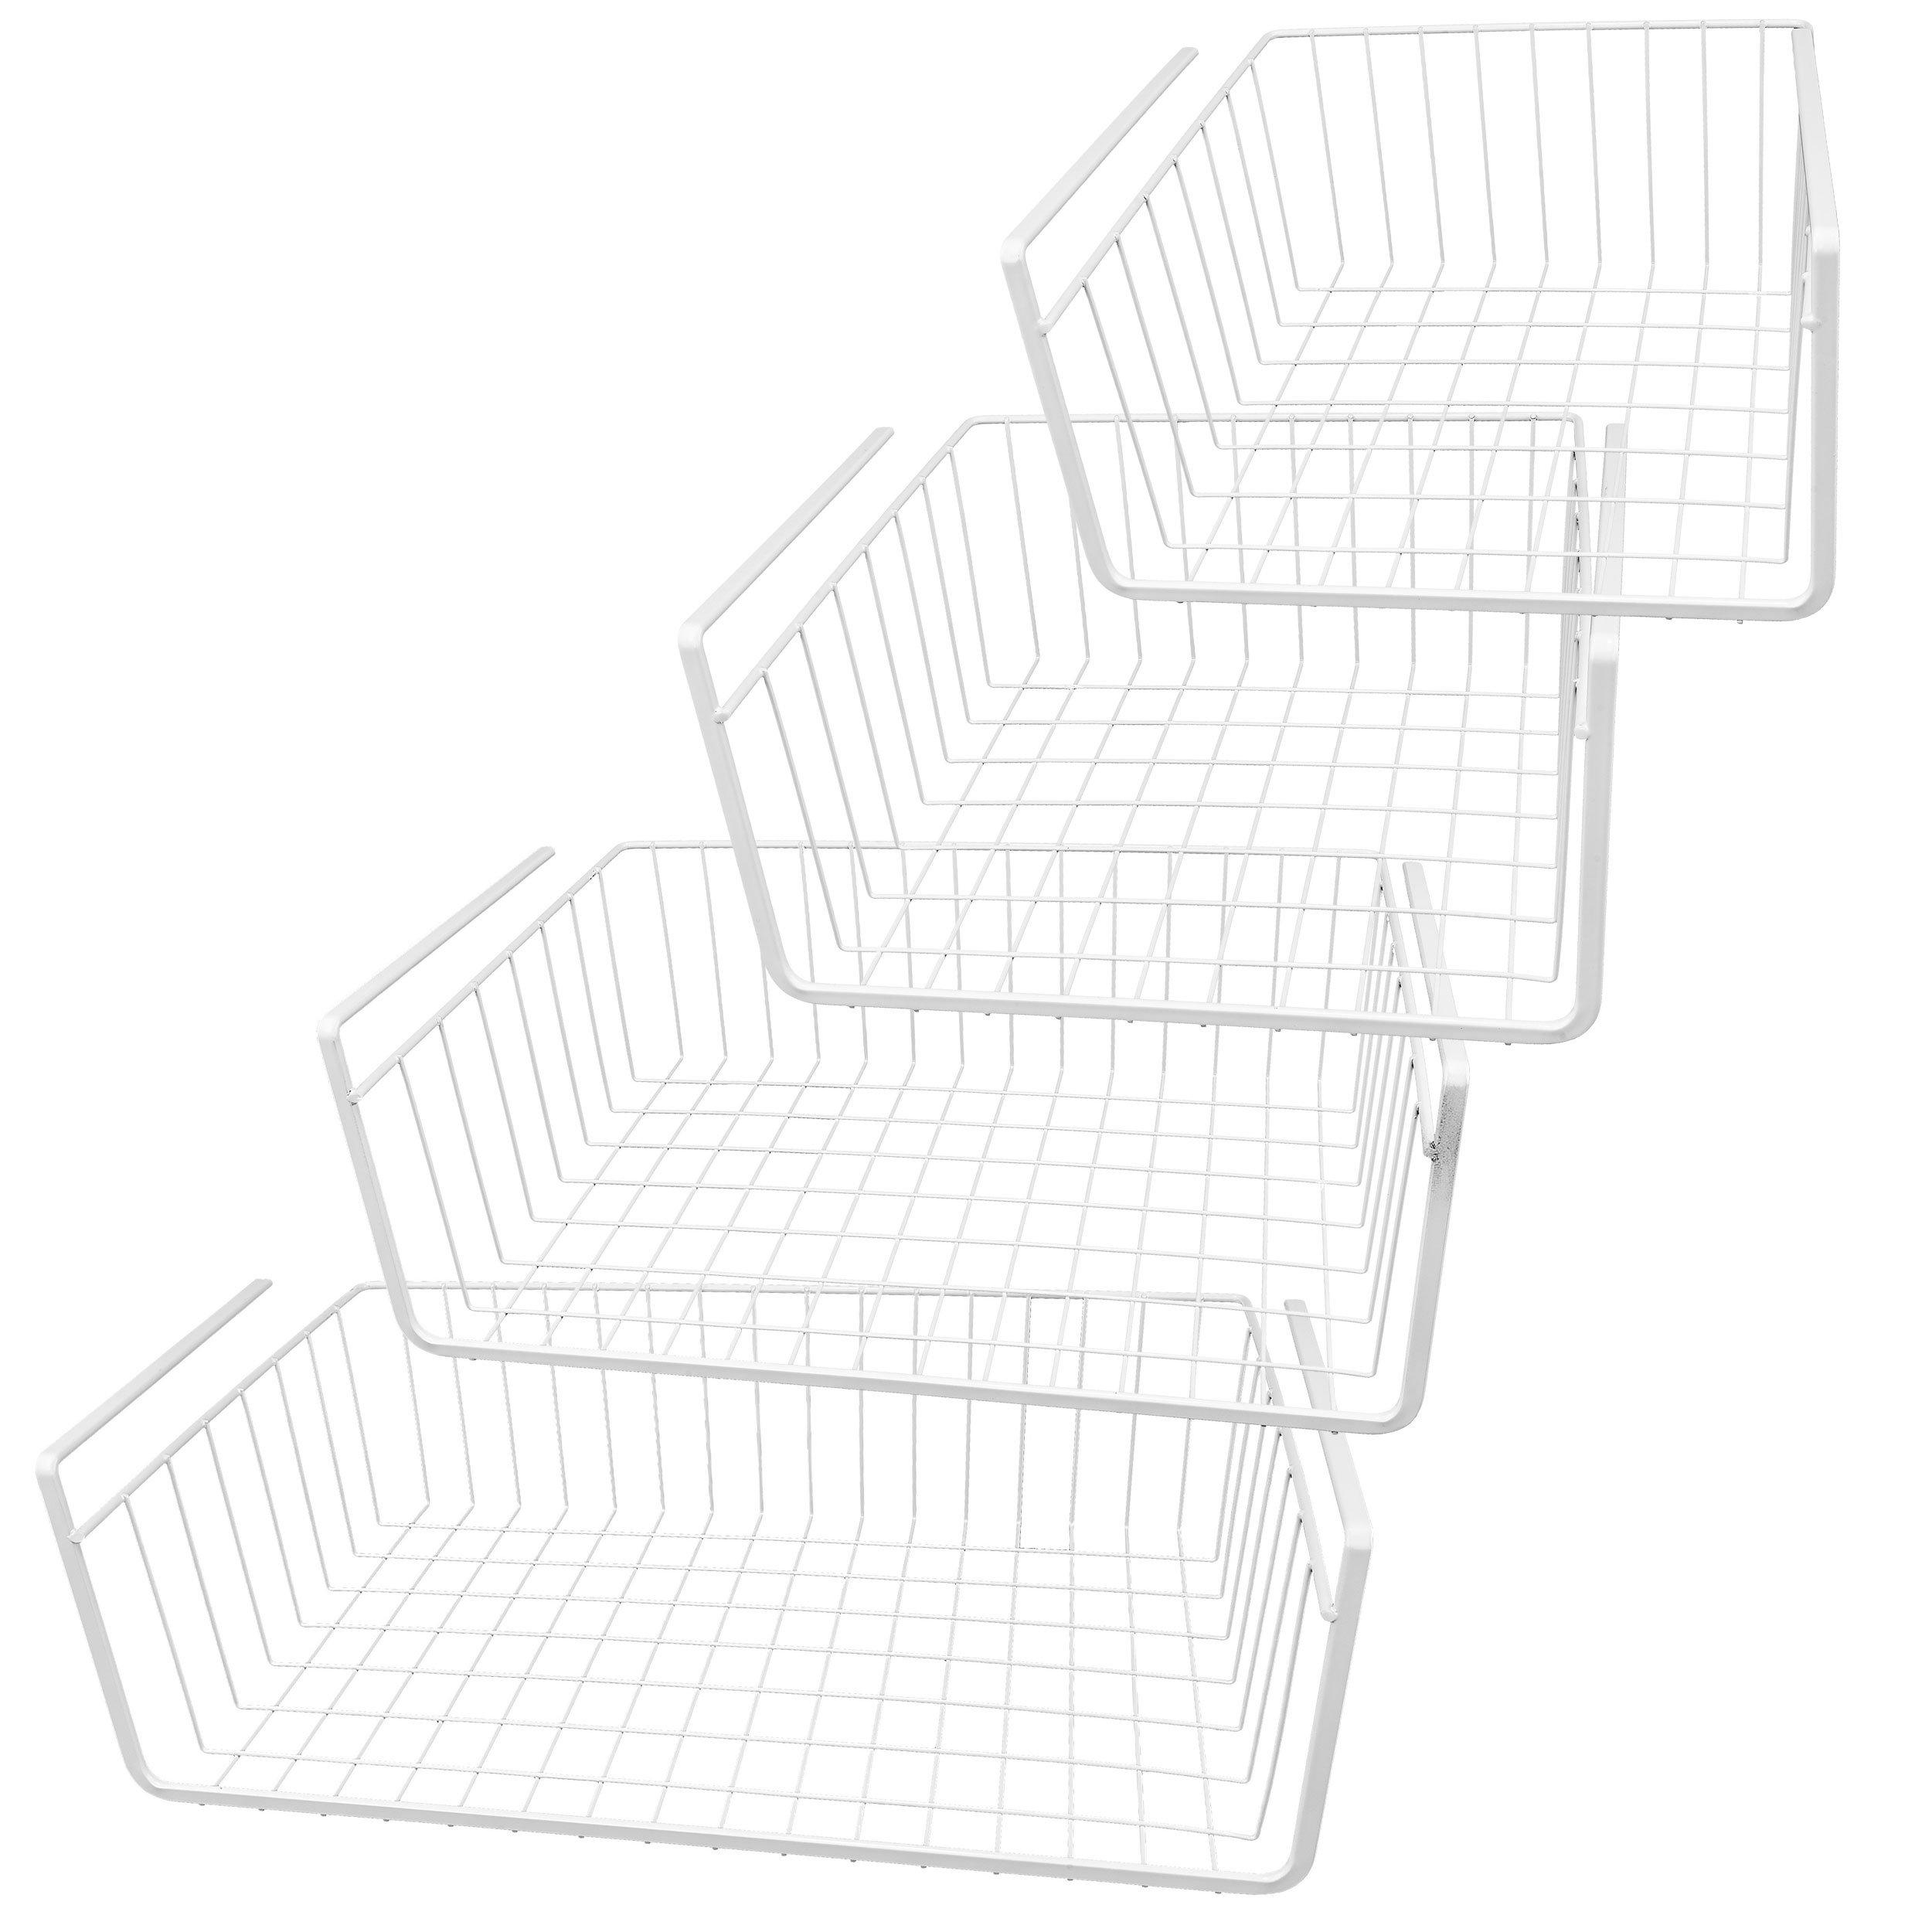 Southern Homewares White Wire Under Shelf Storage Basket 4-Piece Set by Southern Homewares